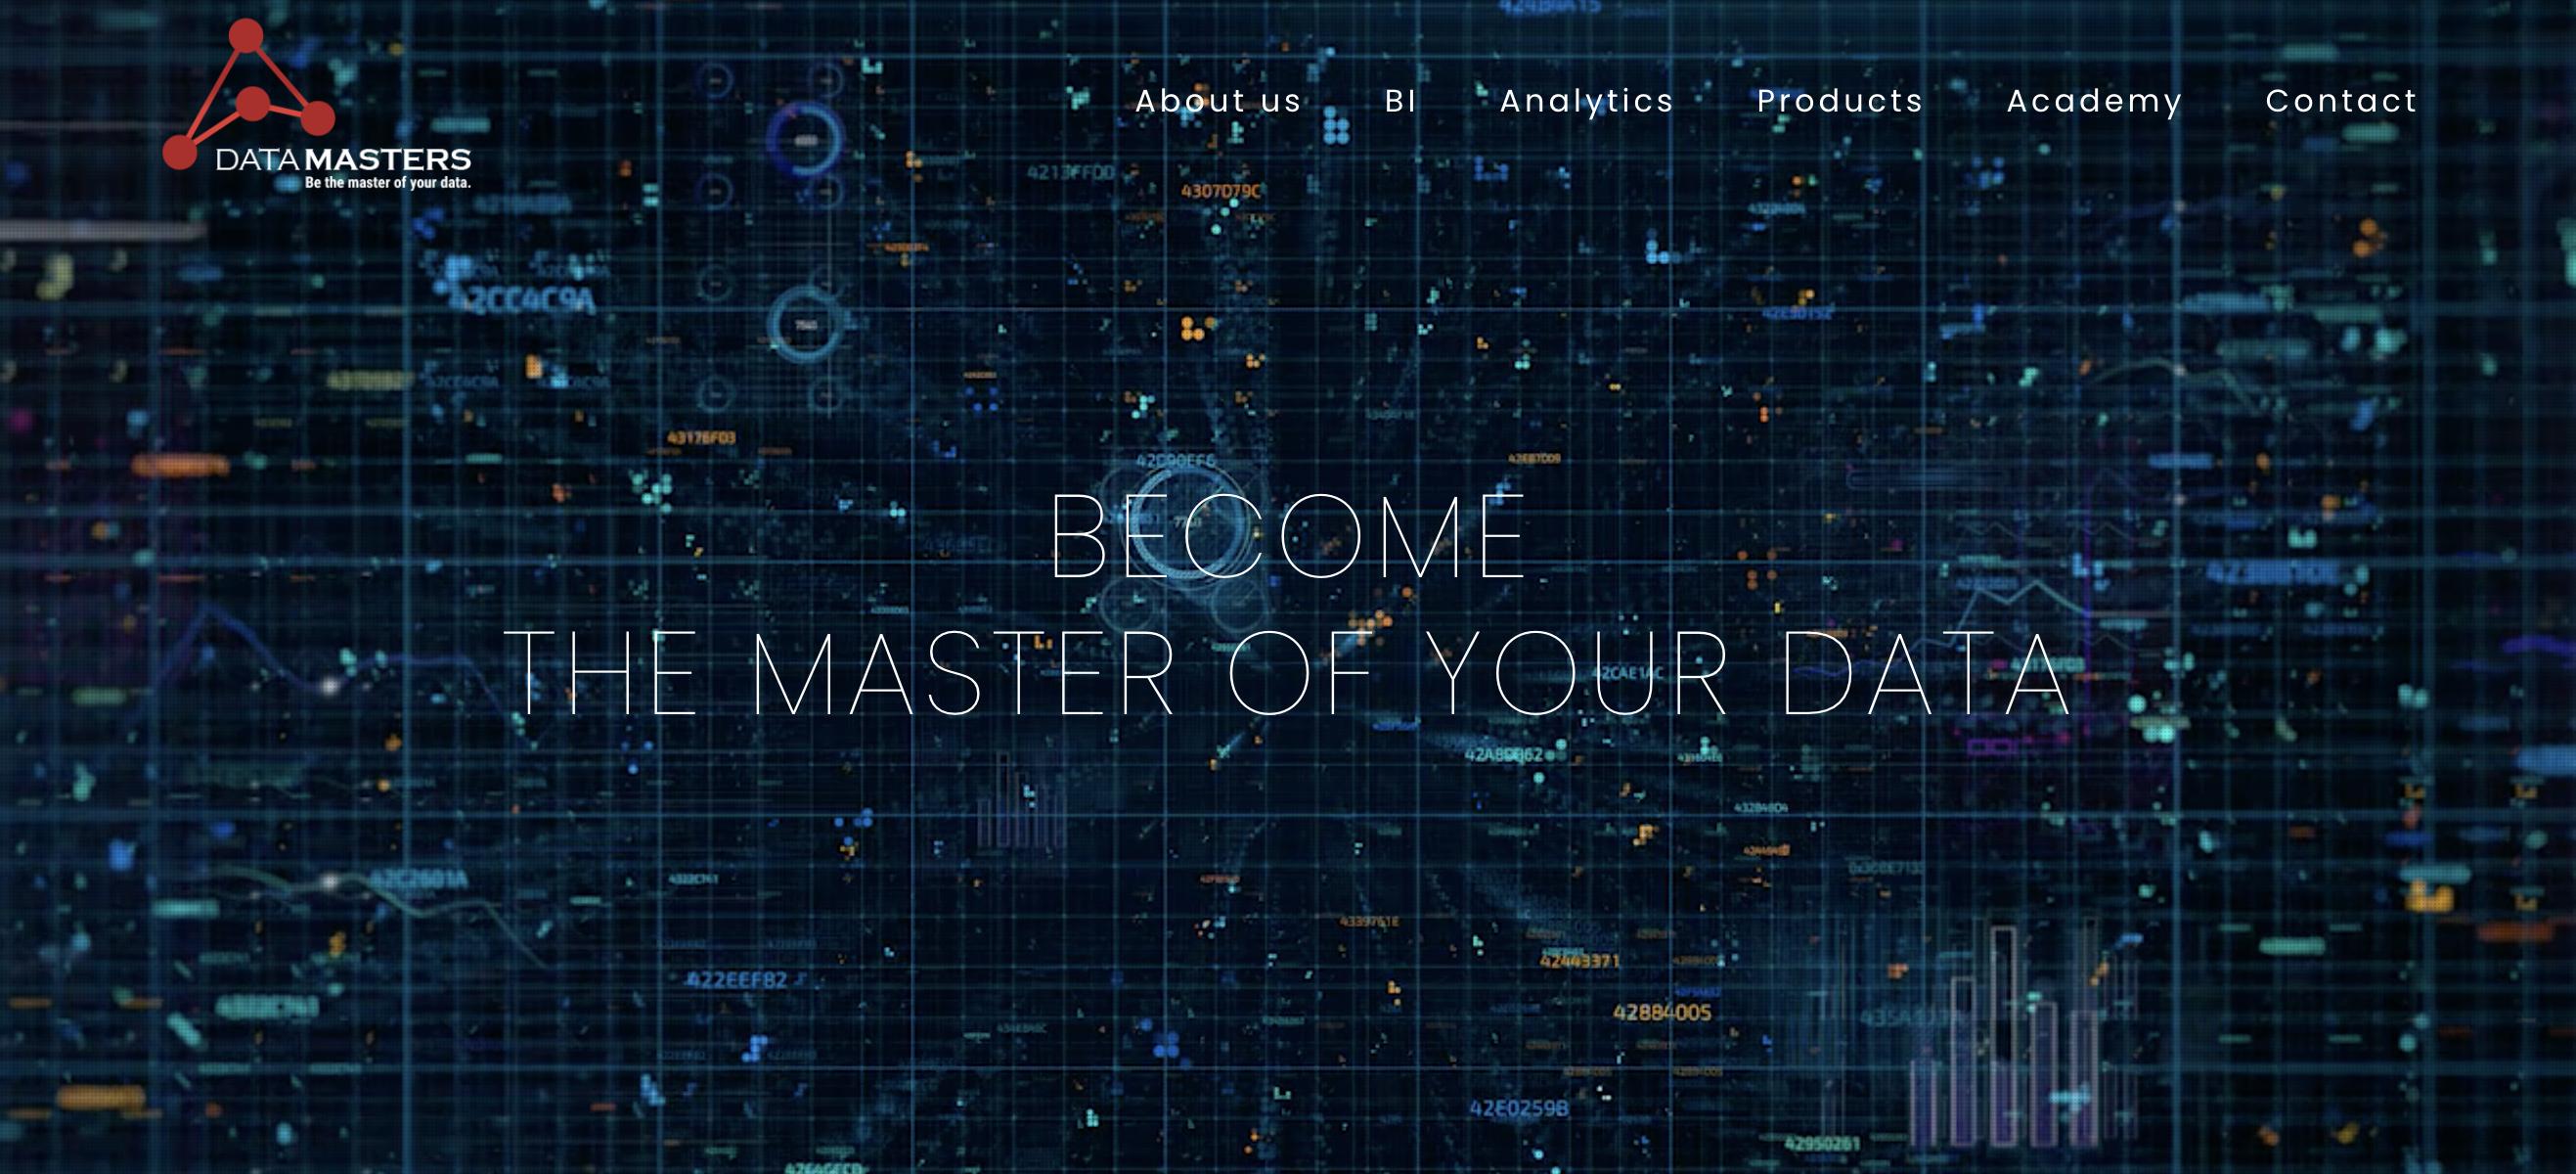 Data_Masters